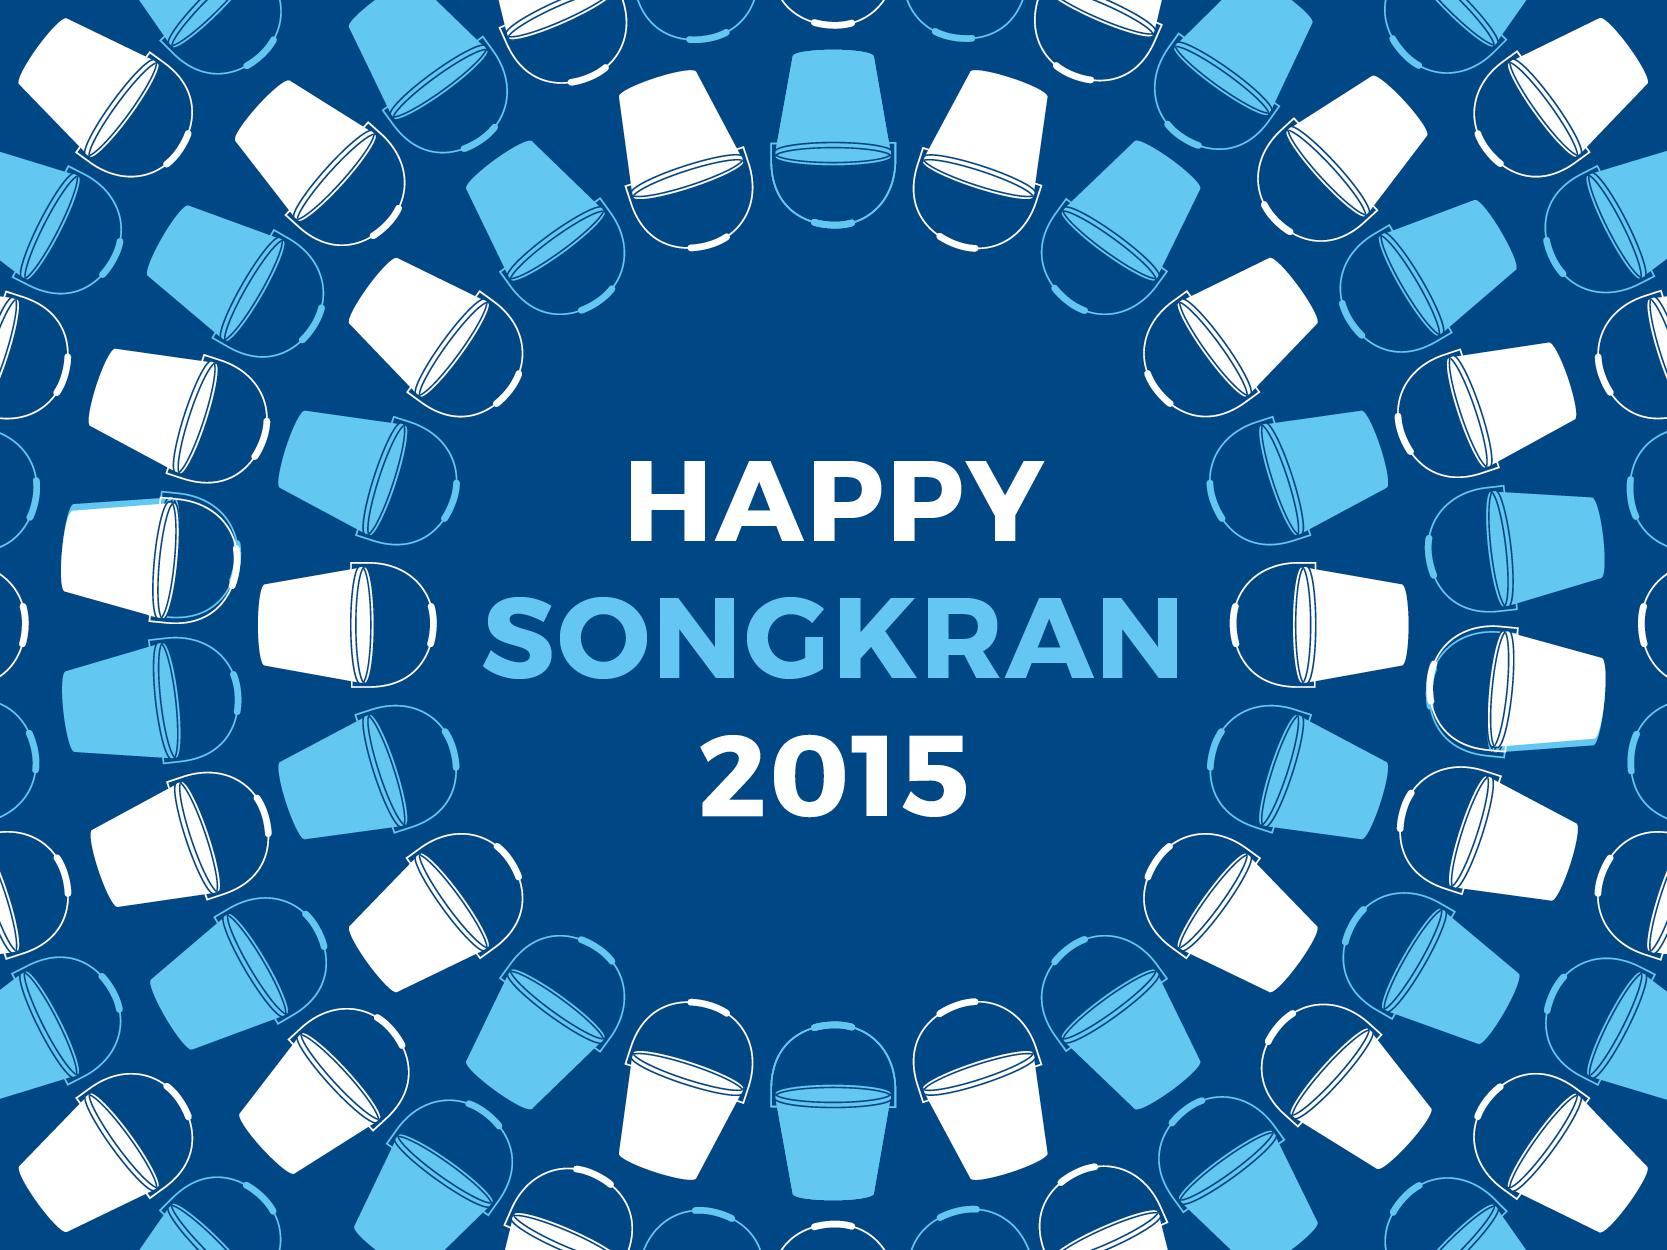 happy-songkran-2015.jpg